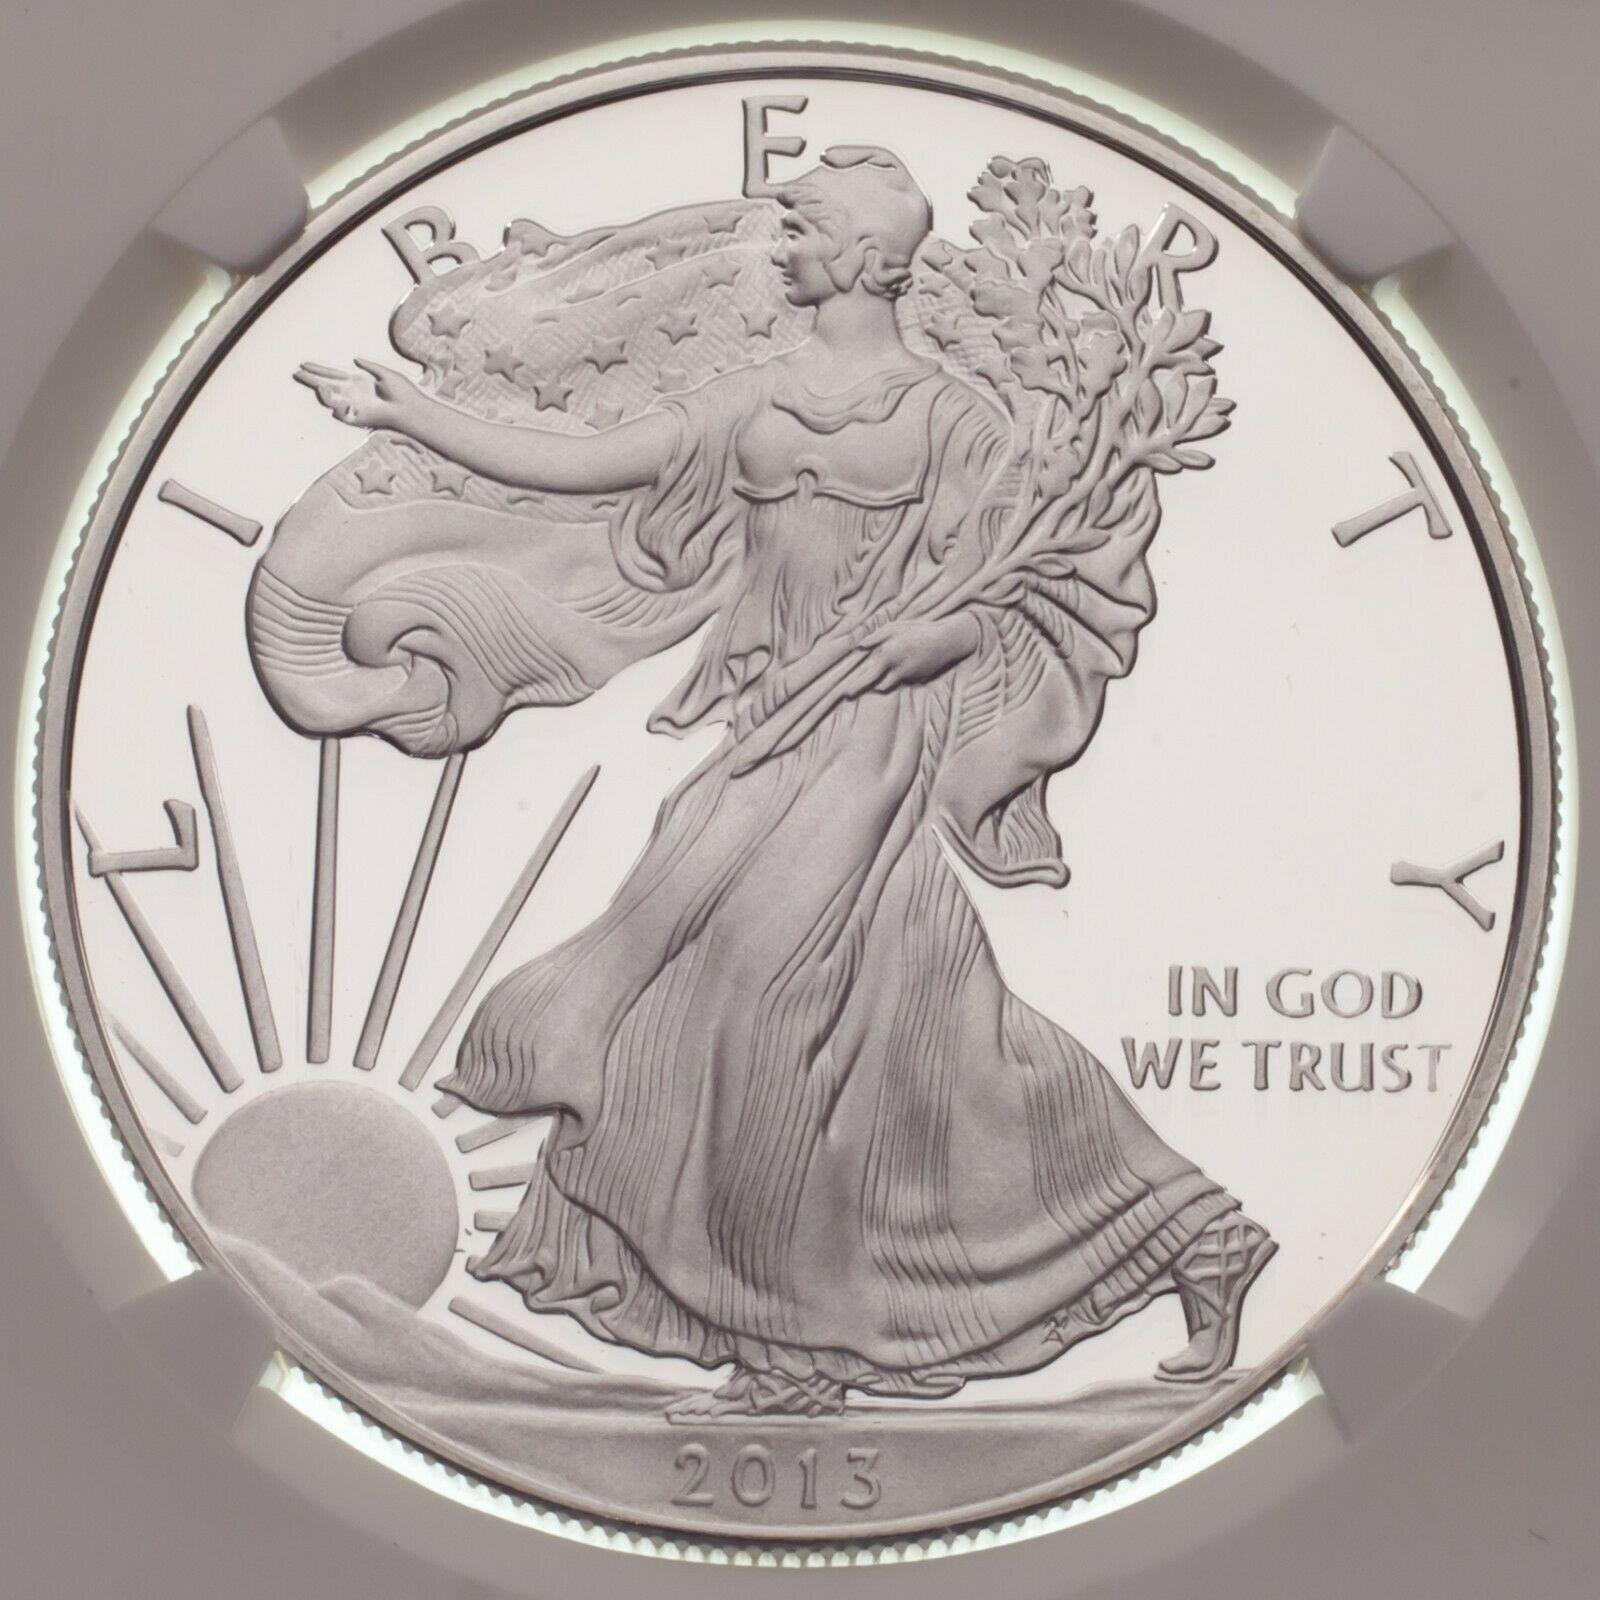 2013-W Silber American Eagle Beweis Ausgewählten von NGC As PF70 Ultra Cameo image 3